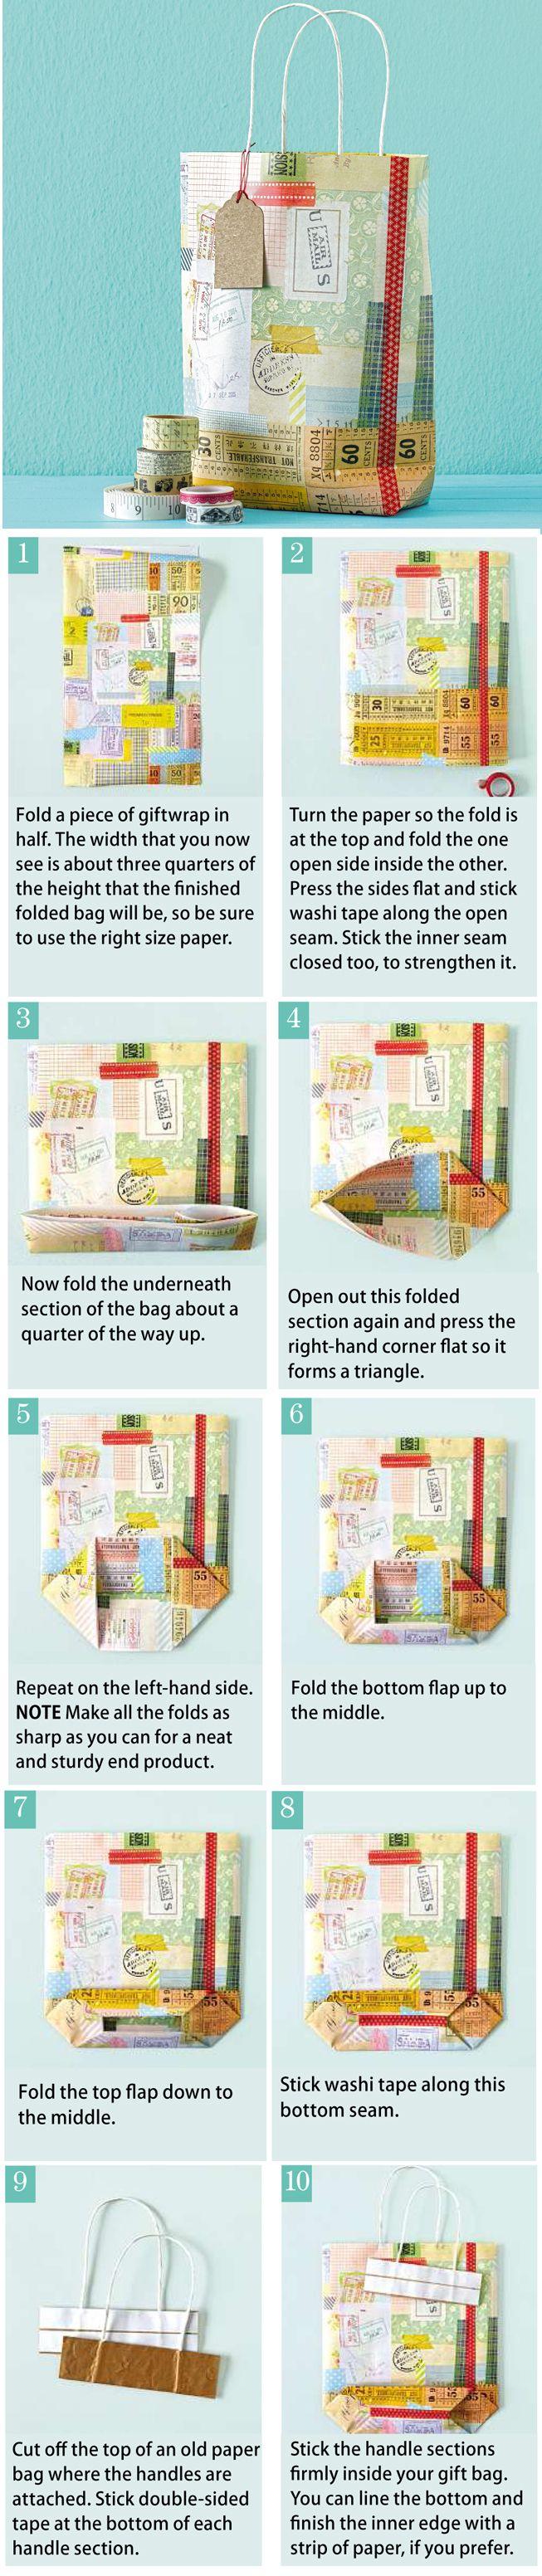 Fold a gift bag